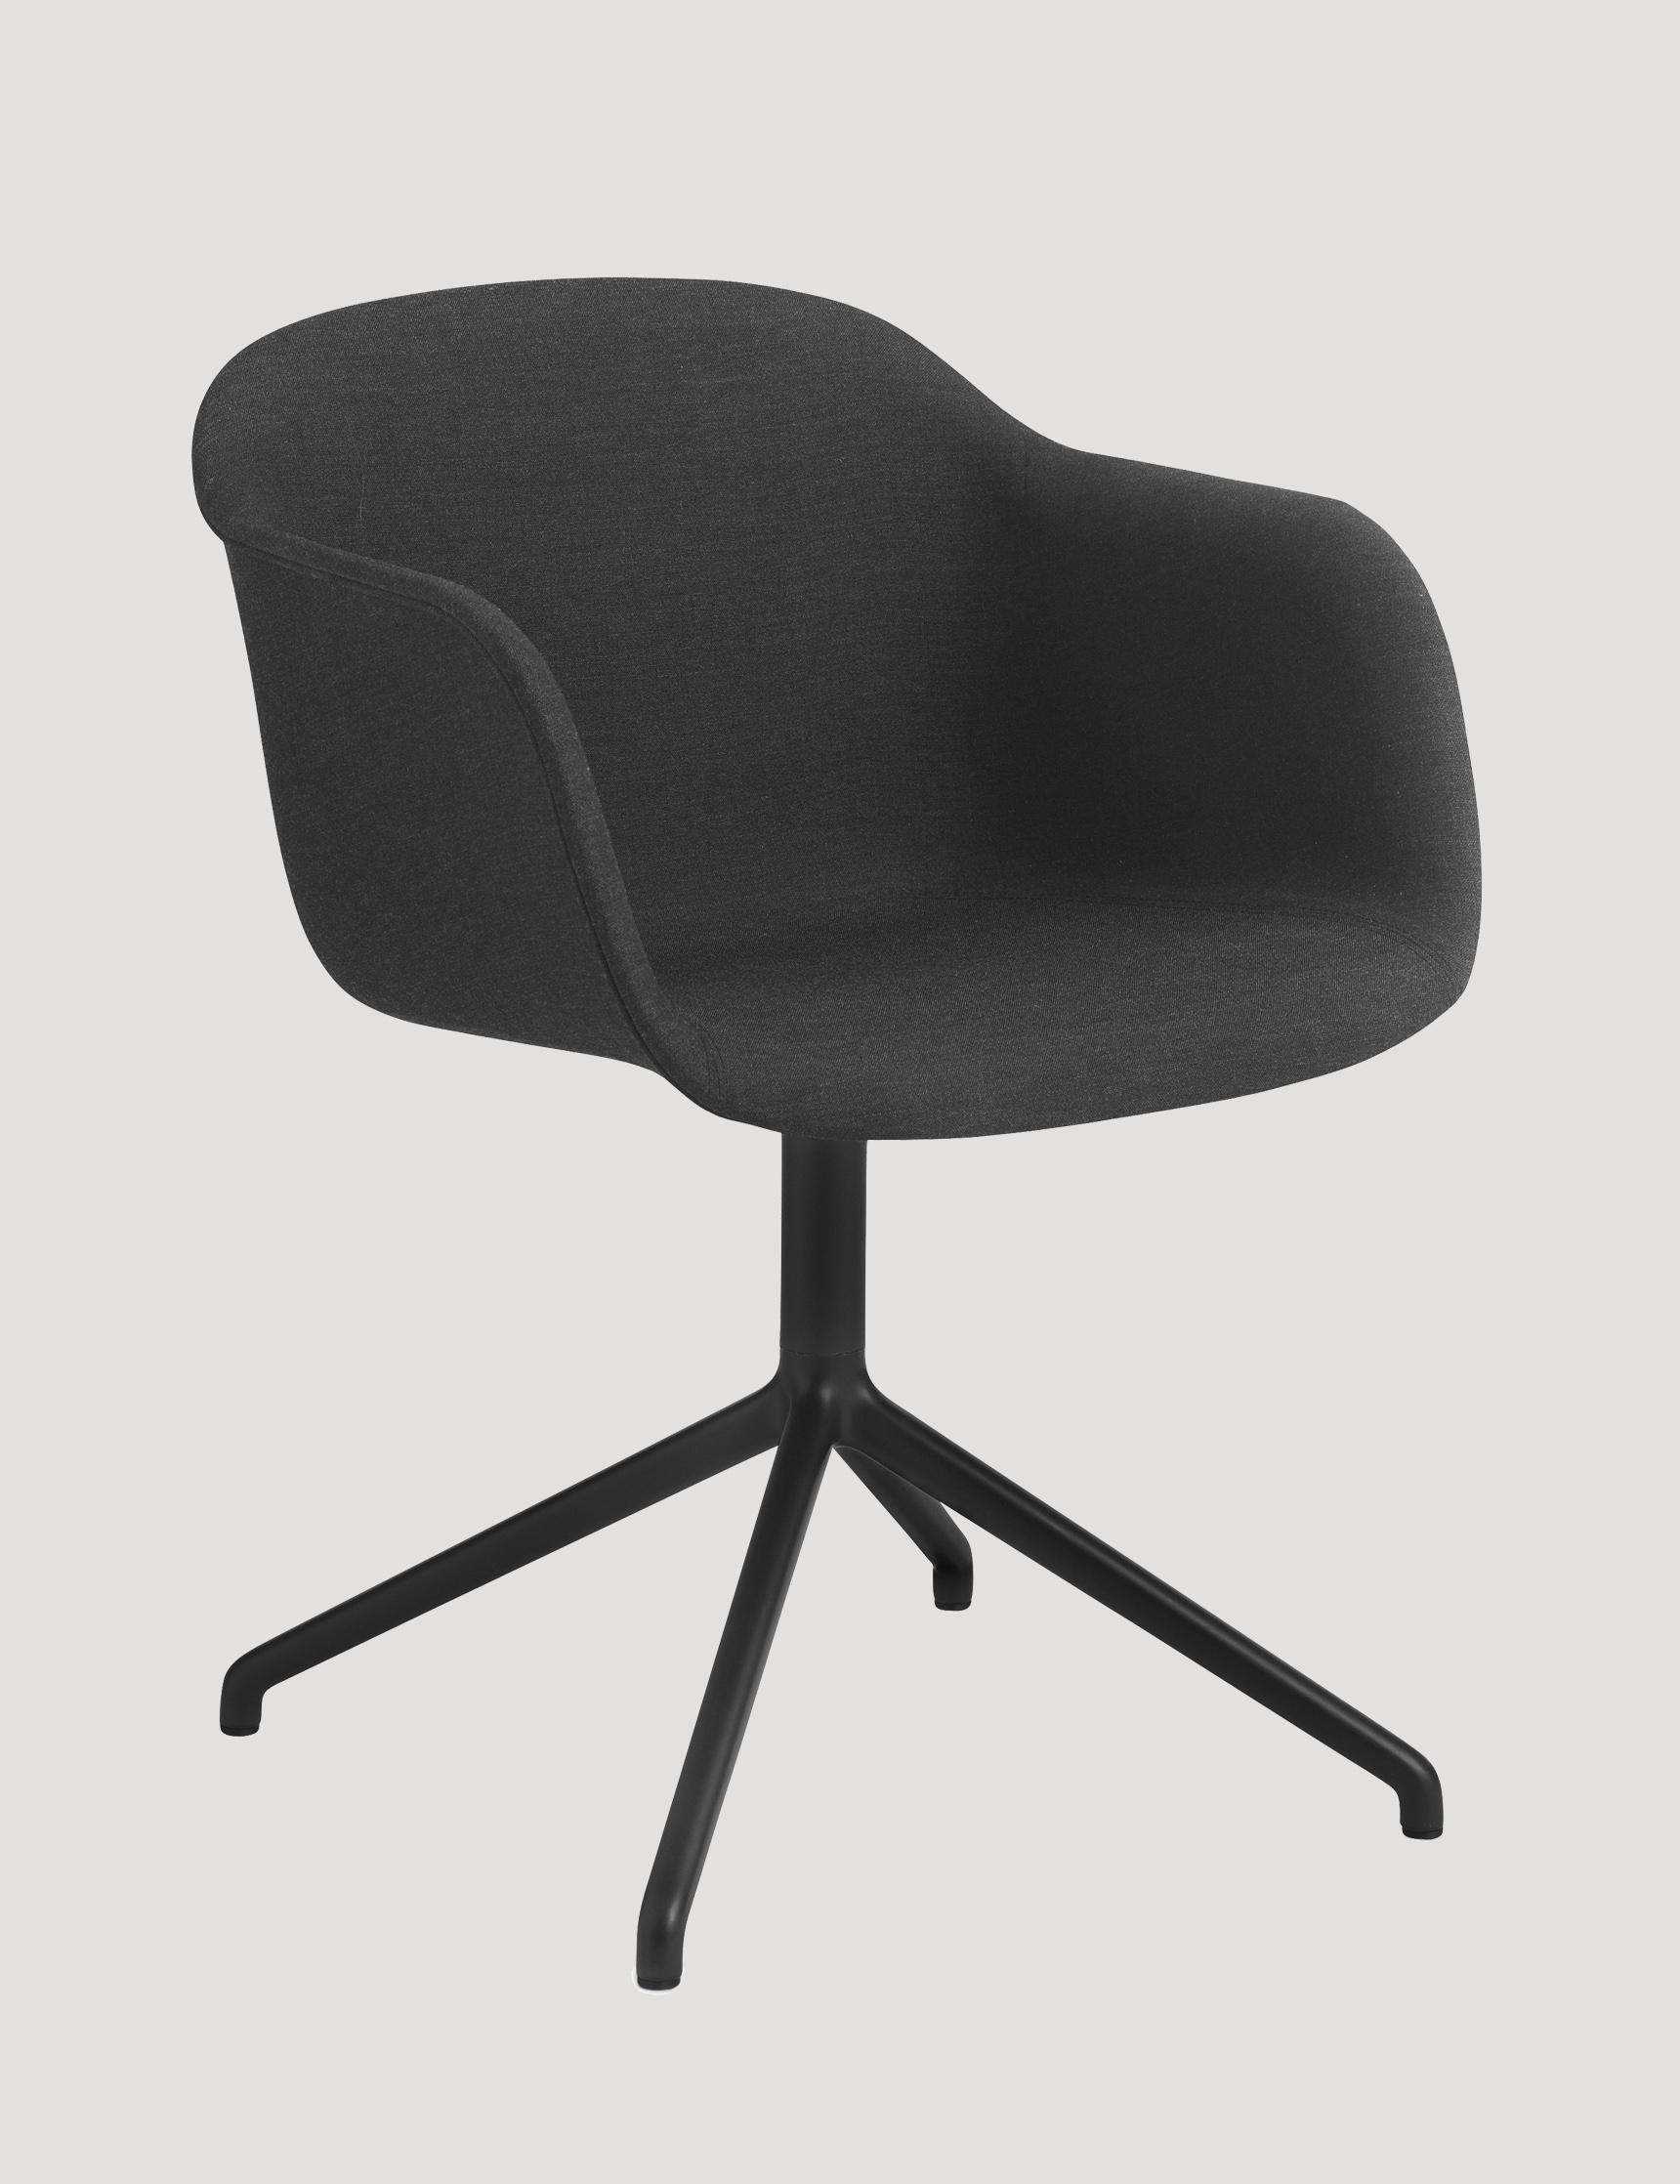 journelles maison home office stuhl fiber muuto journelles. Black Bedroom Furniture Sets. Home Design Ideas